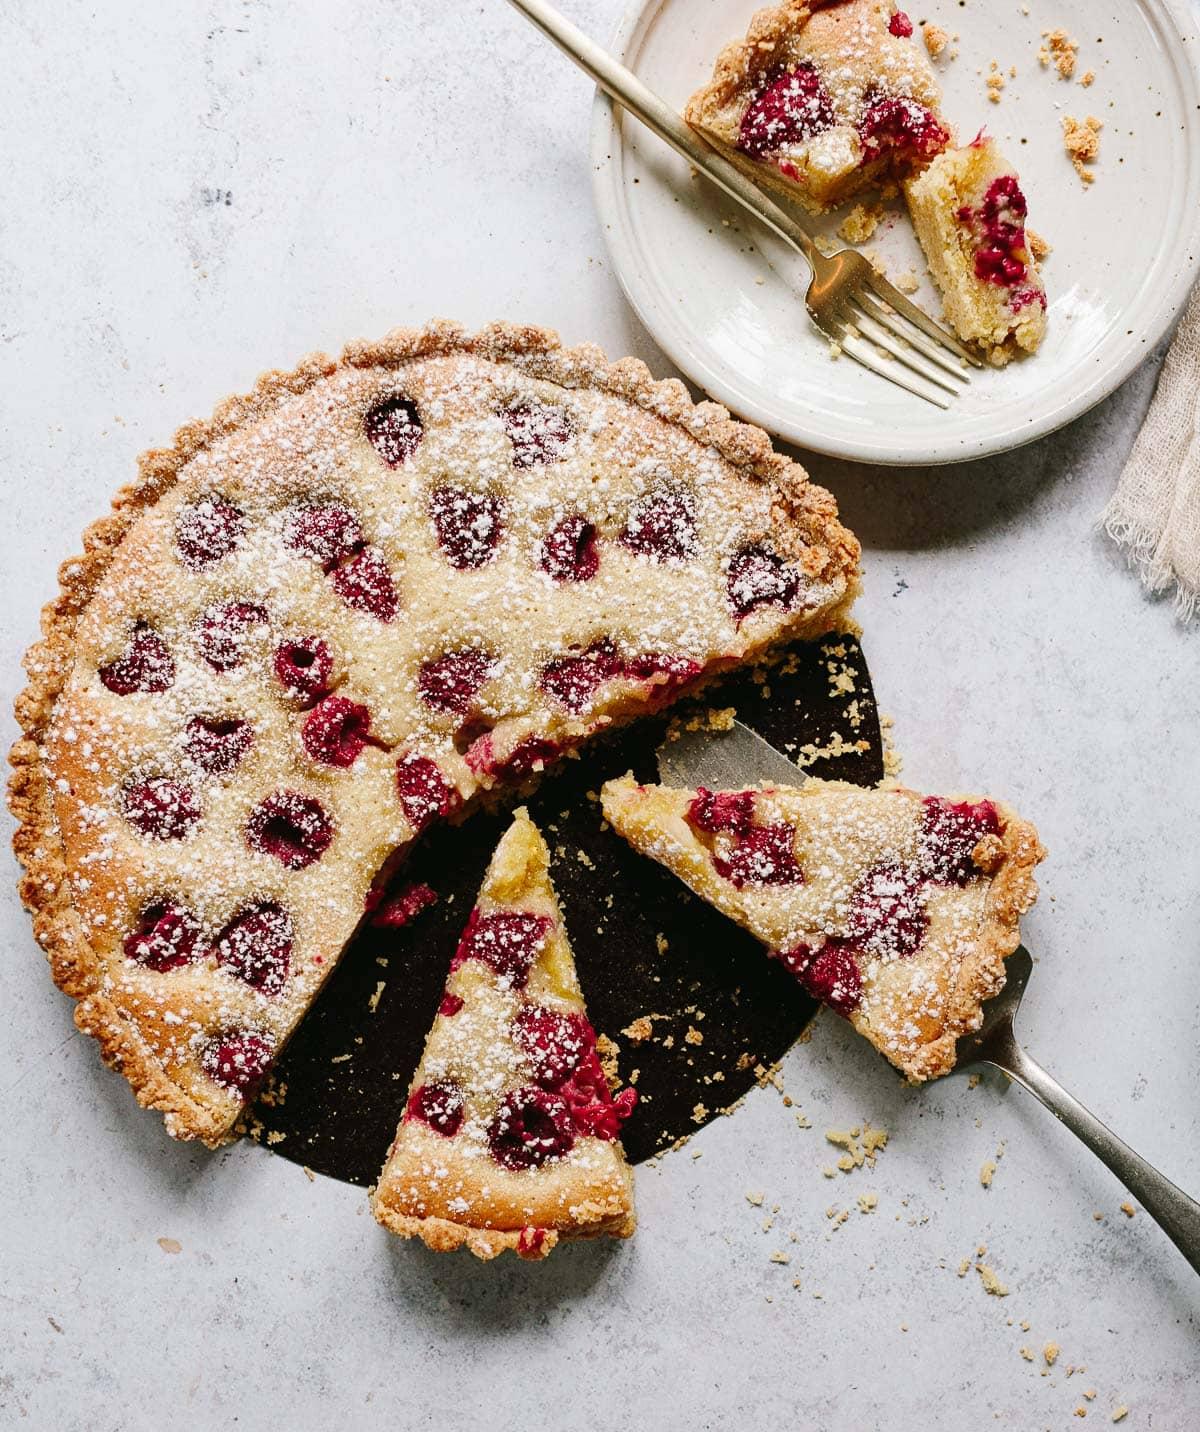 Raspberry Almond Tart with Frangipane Cream